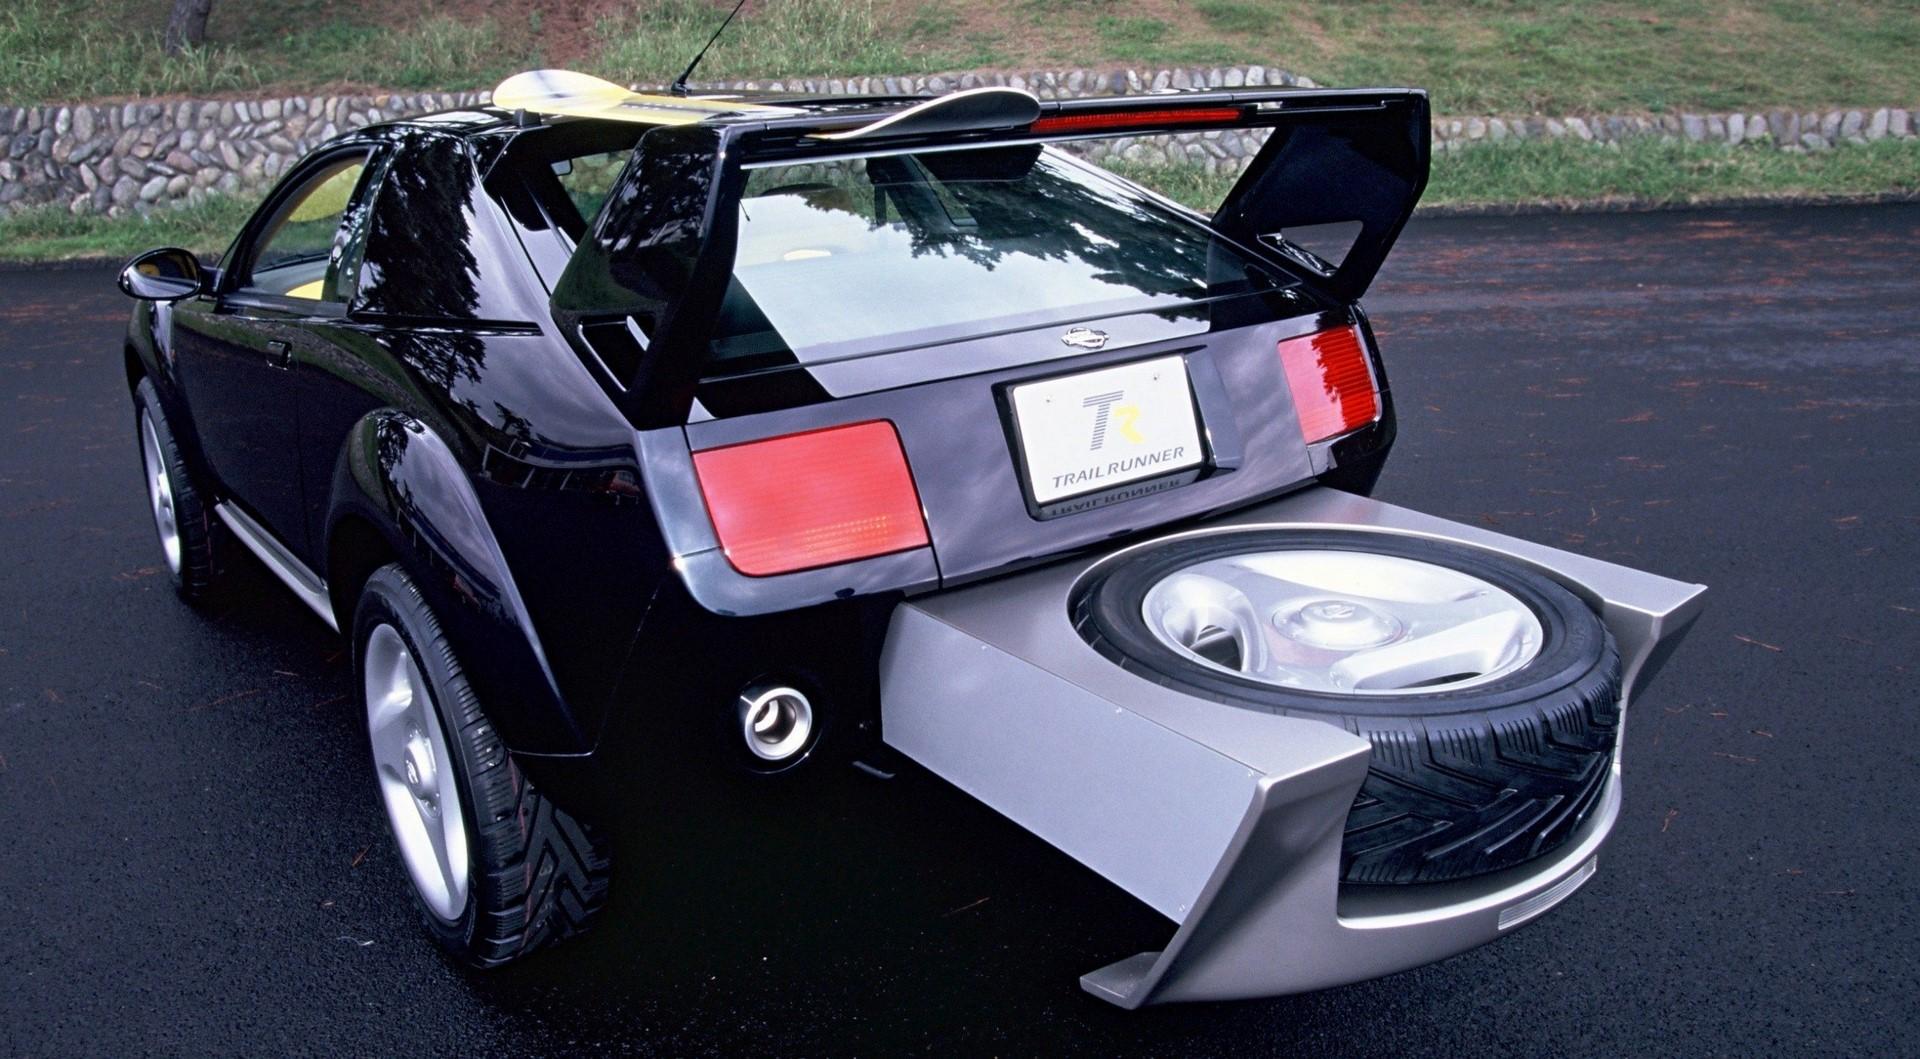 Nissan Trail Runner concept (24)